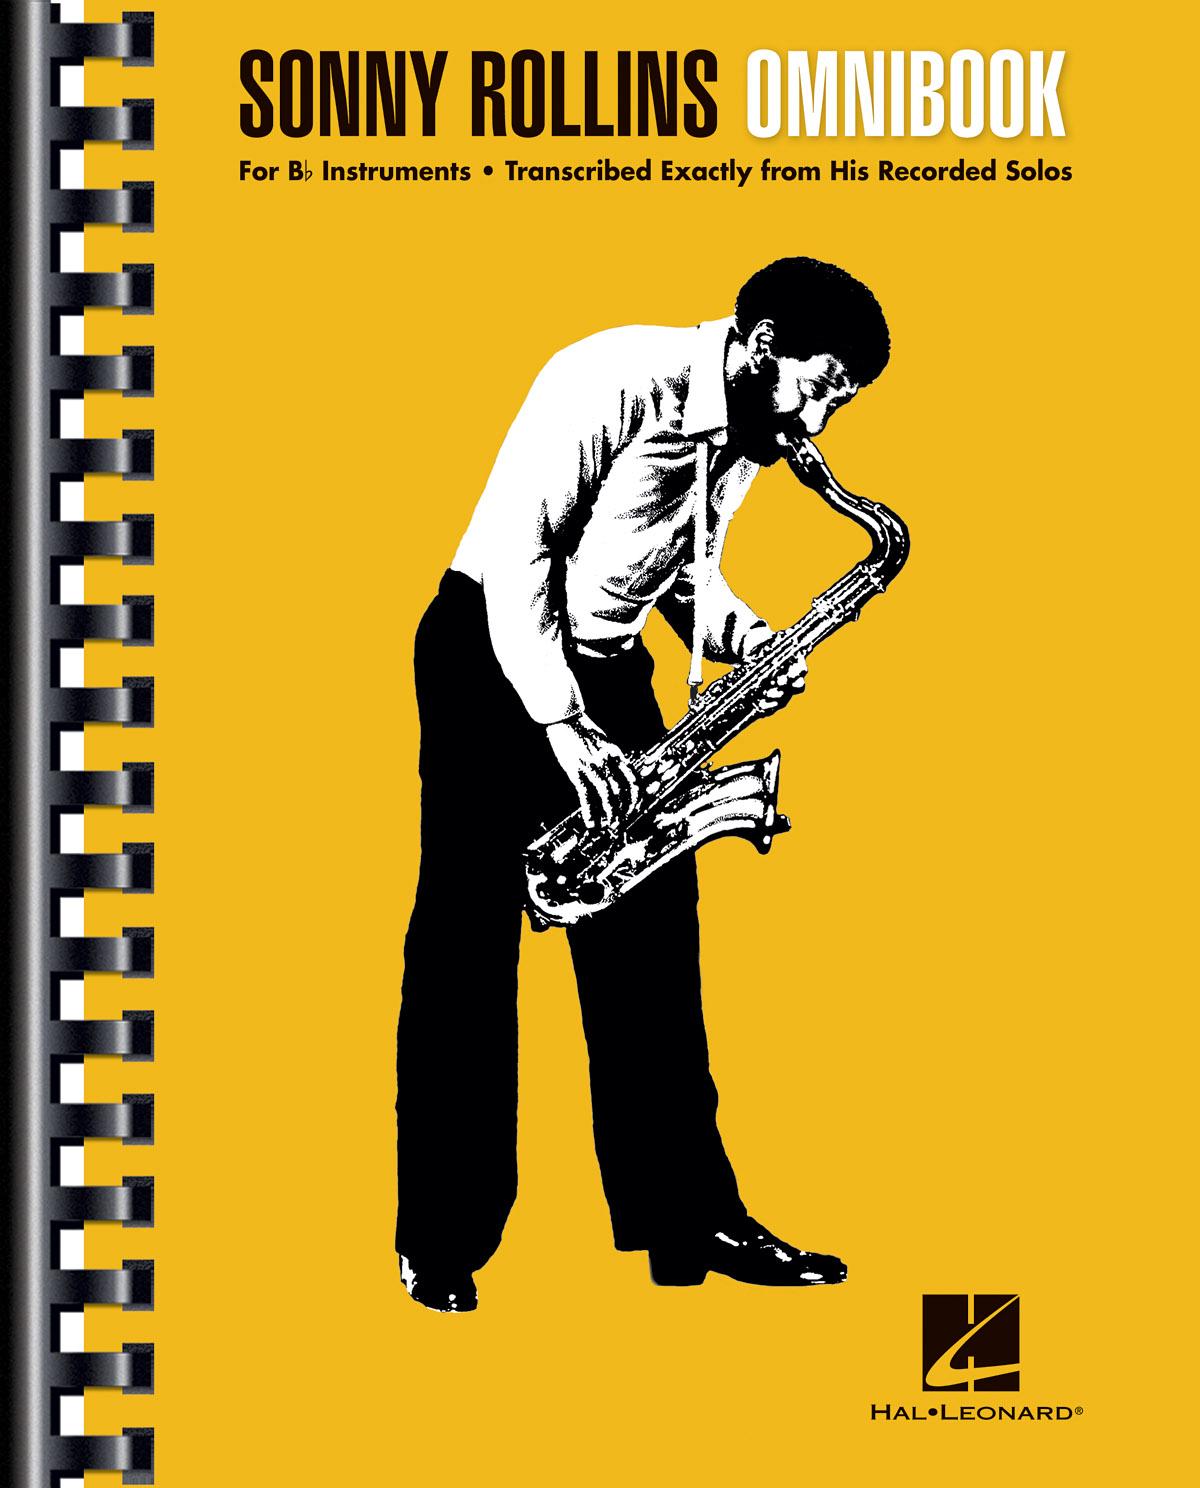 Sonny Rollins: Sonny Rollins Omnibook for B-Flat Instruments: B-Flat Instrument: